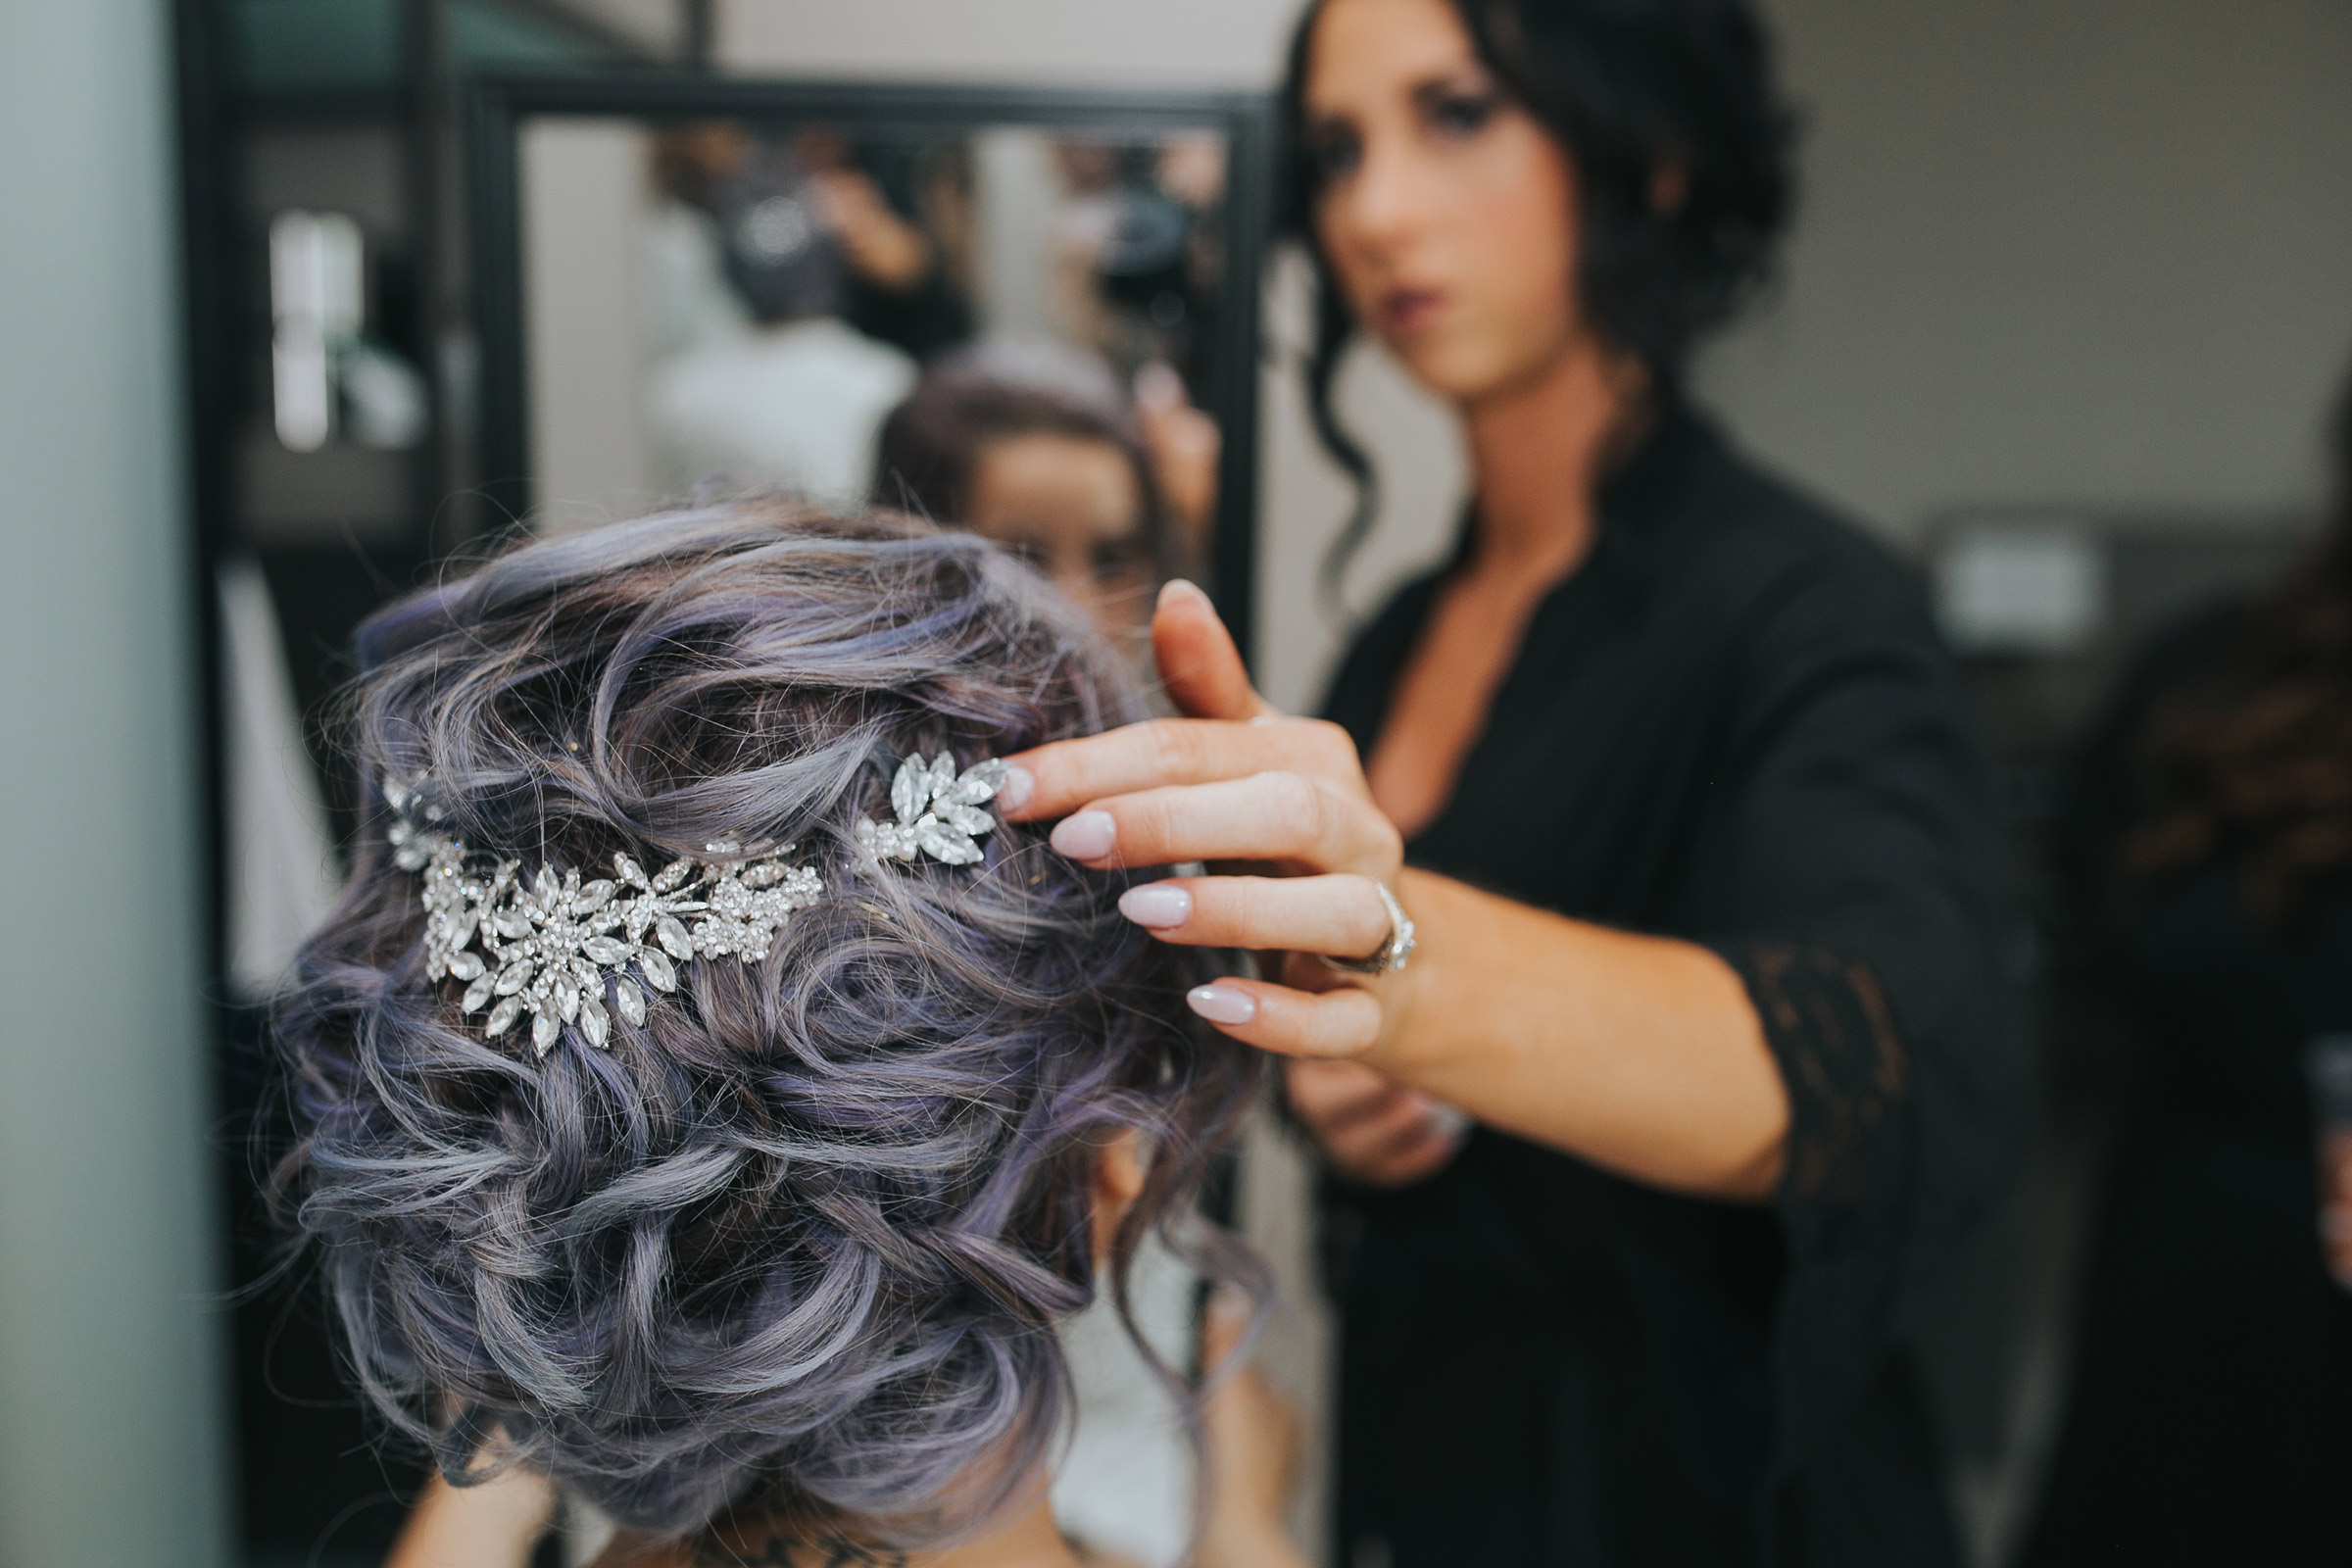 maid-of-honor-putting-hair-clip-in-brides-hair-desmoines-iowa-ac-hotel-raelyn-ramey-photography.jpg